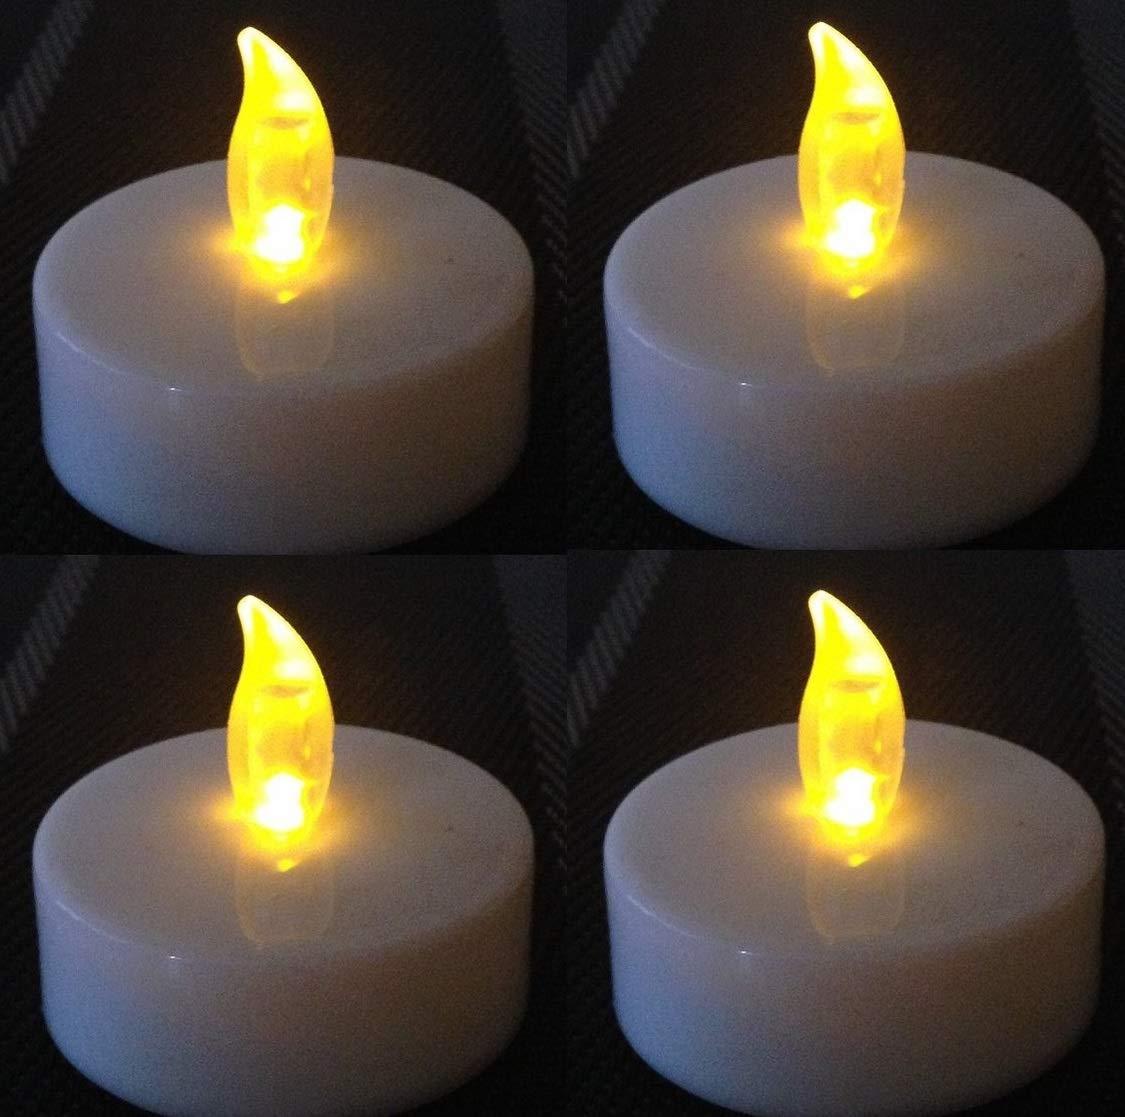 12er Set LED Teelichter Teelicht elektrisch Kerze Kerzen candle flackernd LEDs